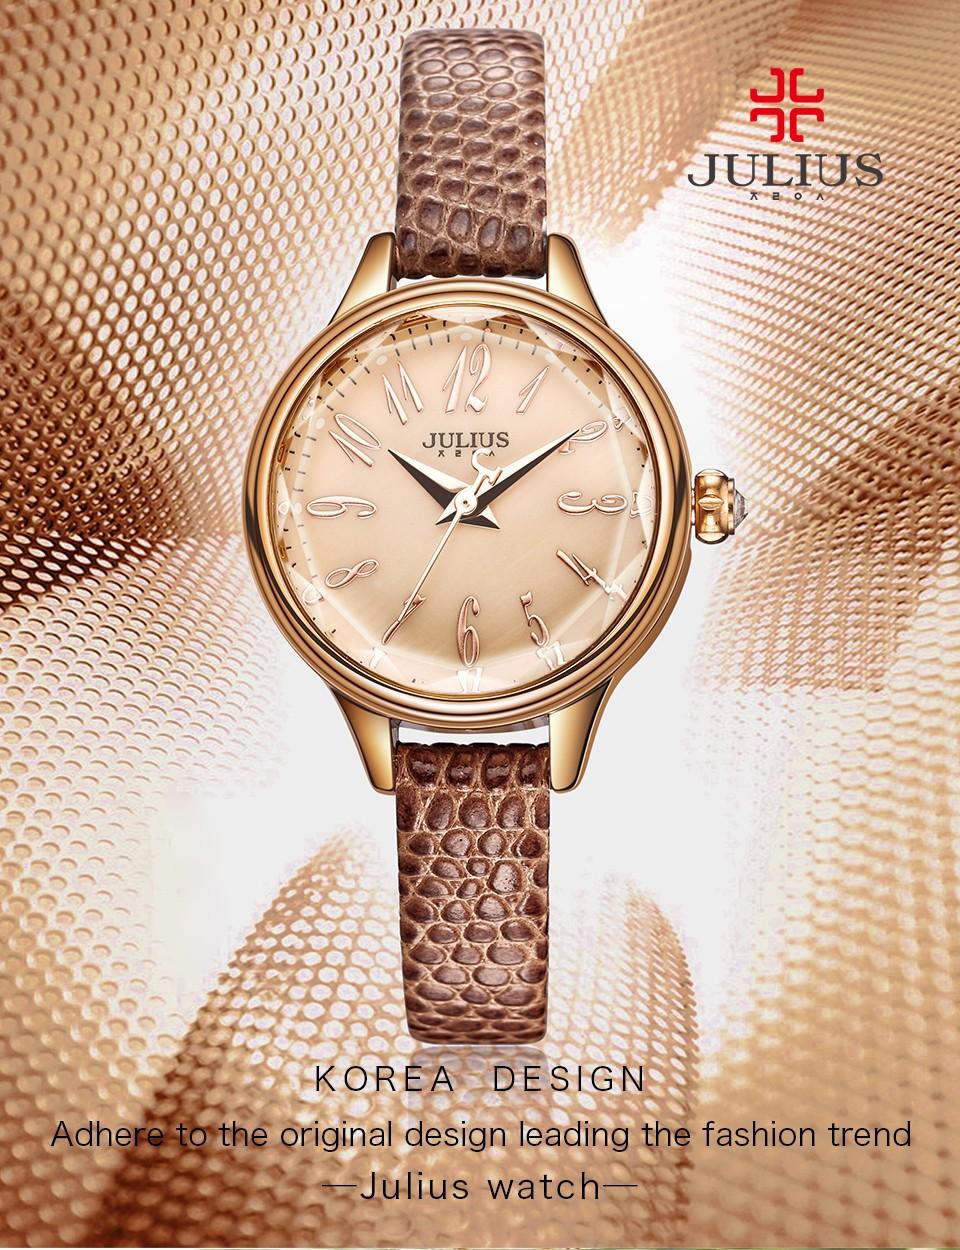 Julio 2016 invierno nuevo cocodrilo genuino correa de cuero Rosa oro relojes  mujer dama moda vestido muñeca reloj horas reloj ja-932Marca  JuliusModelo   ... e858fd90e8ab